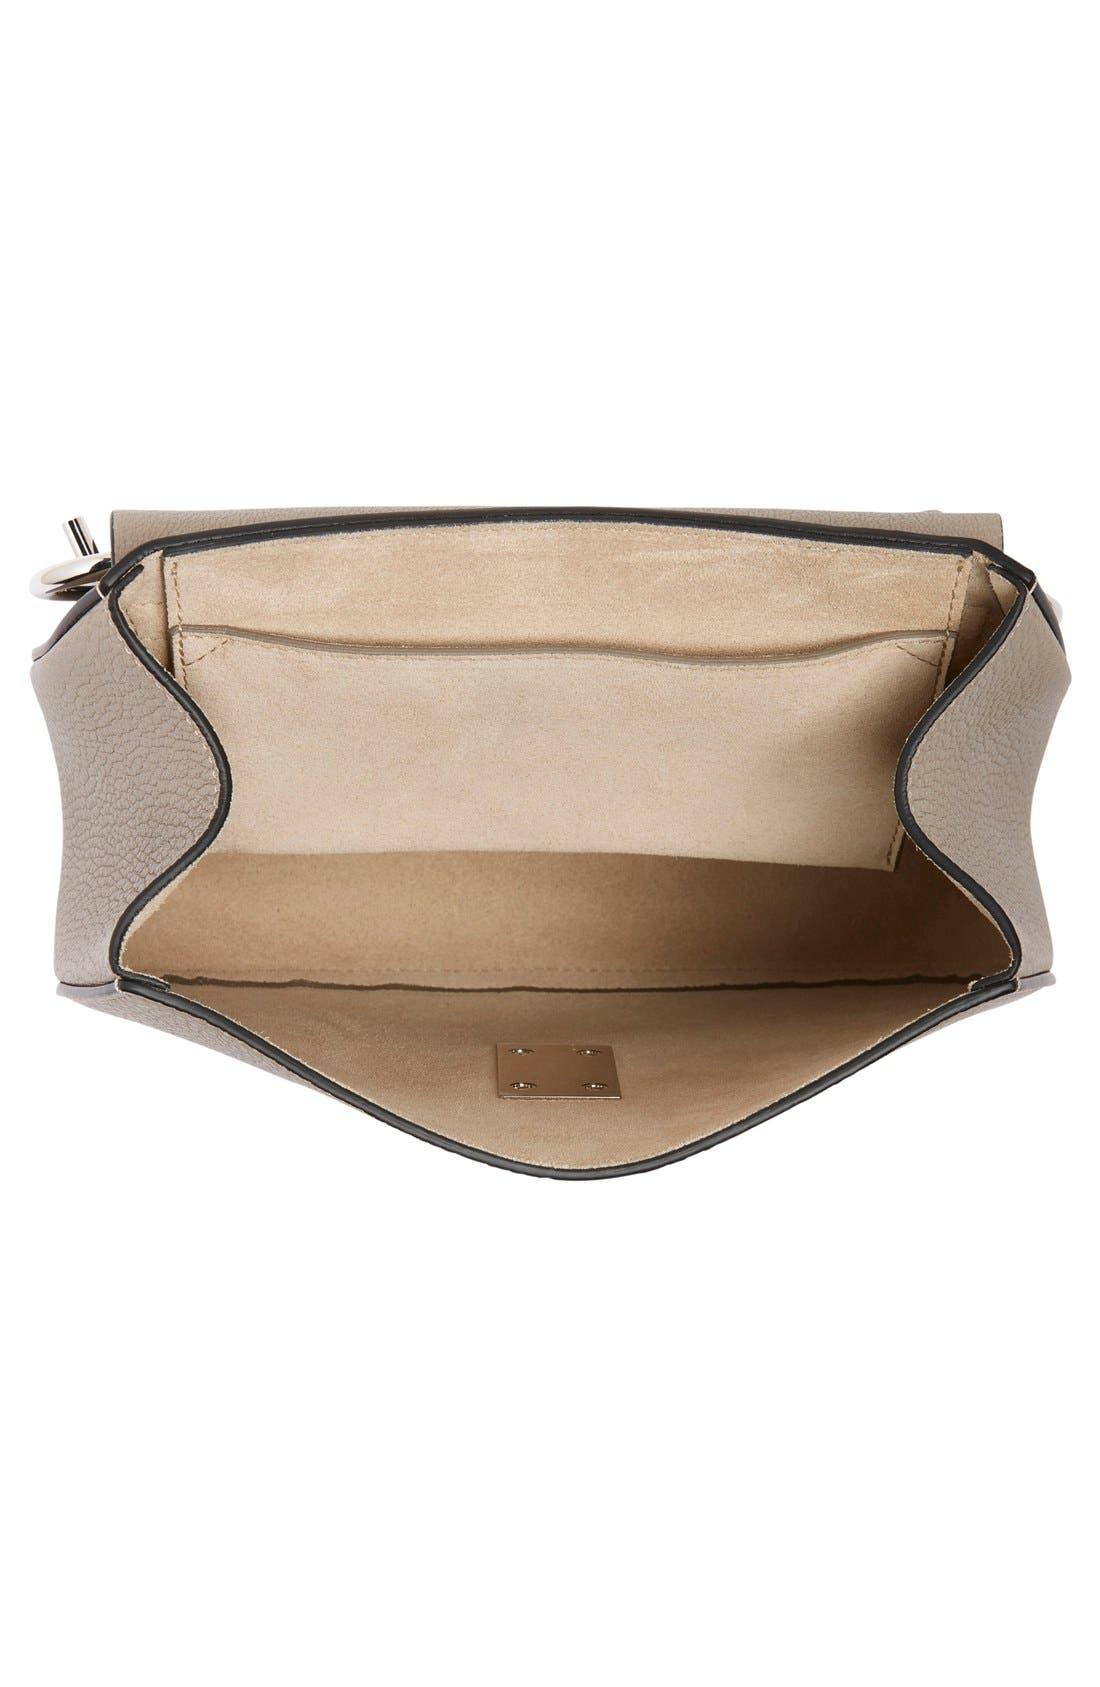 'Small Drew' Leather Shoulder Bag,                             Alternate thumbnail 4, color,                             Motty Grey